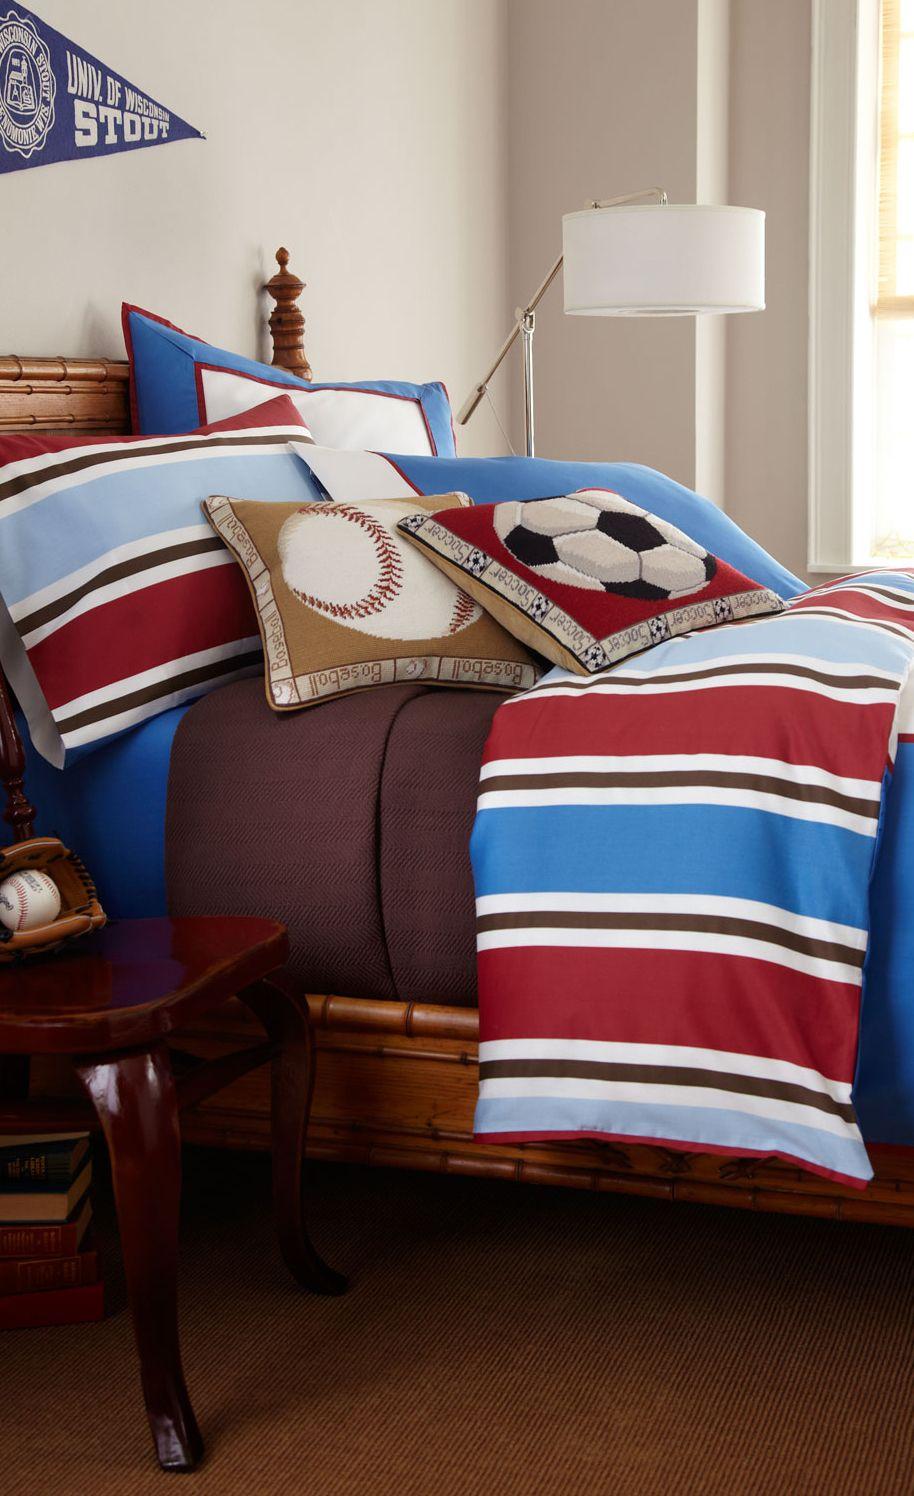 Boys Bedding & Room Decor